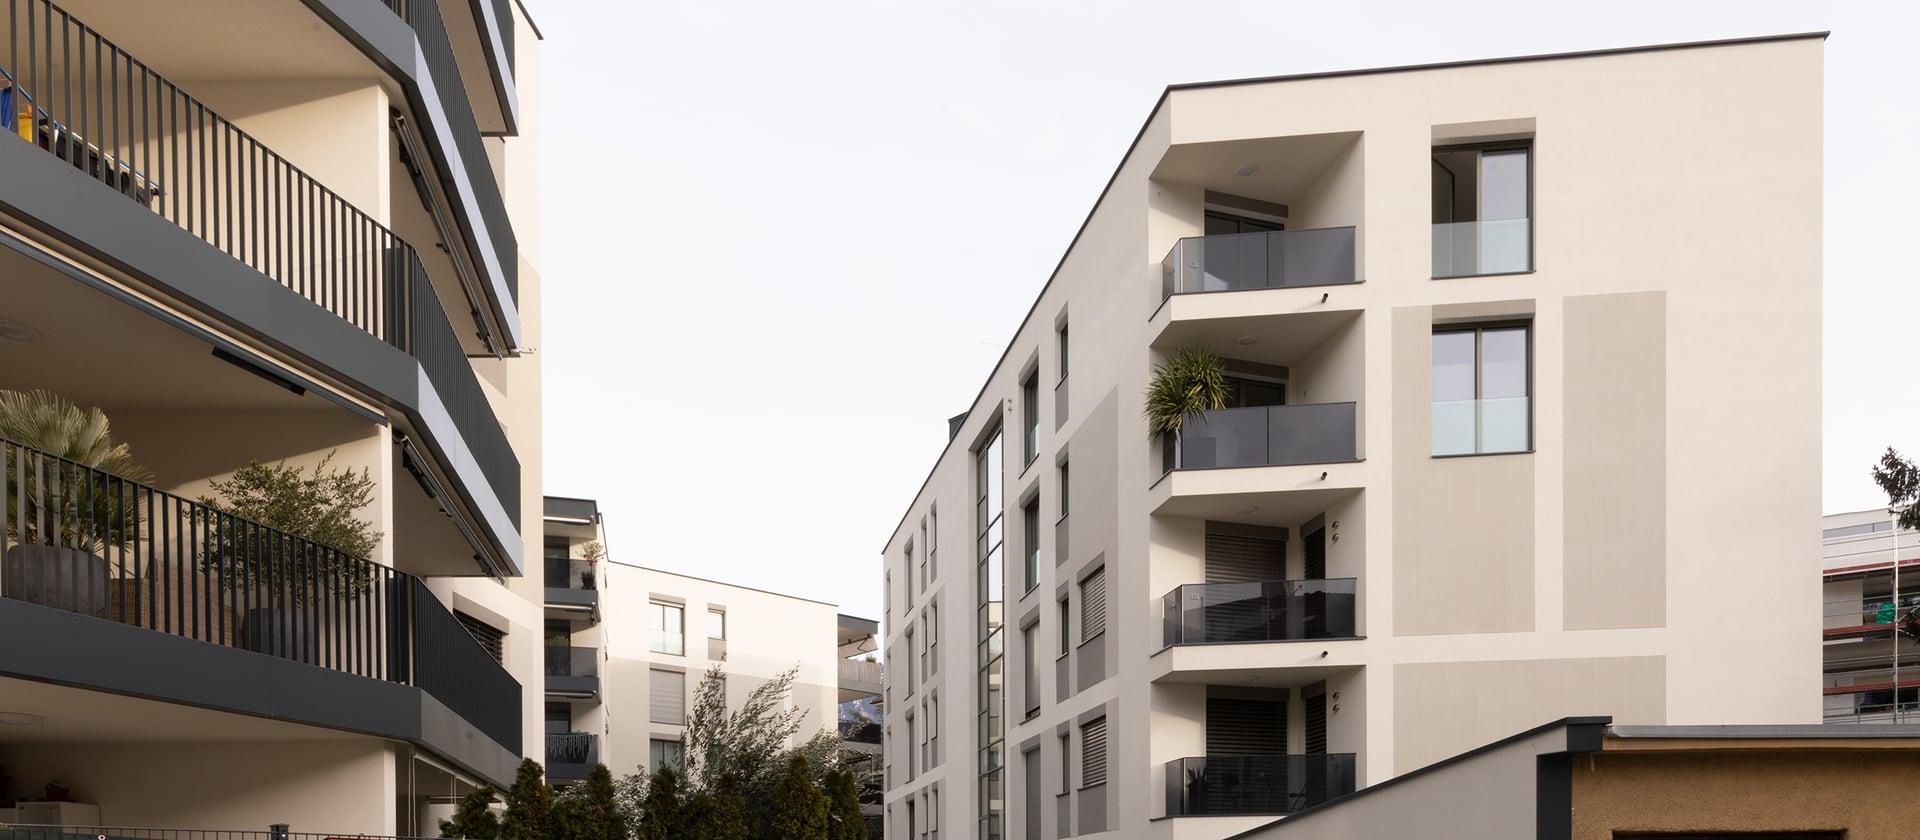 The Manzoni Garden apartment complex in Meran